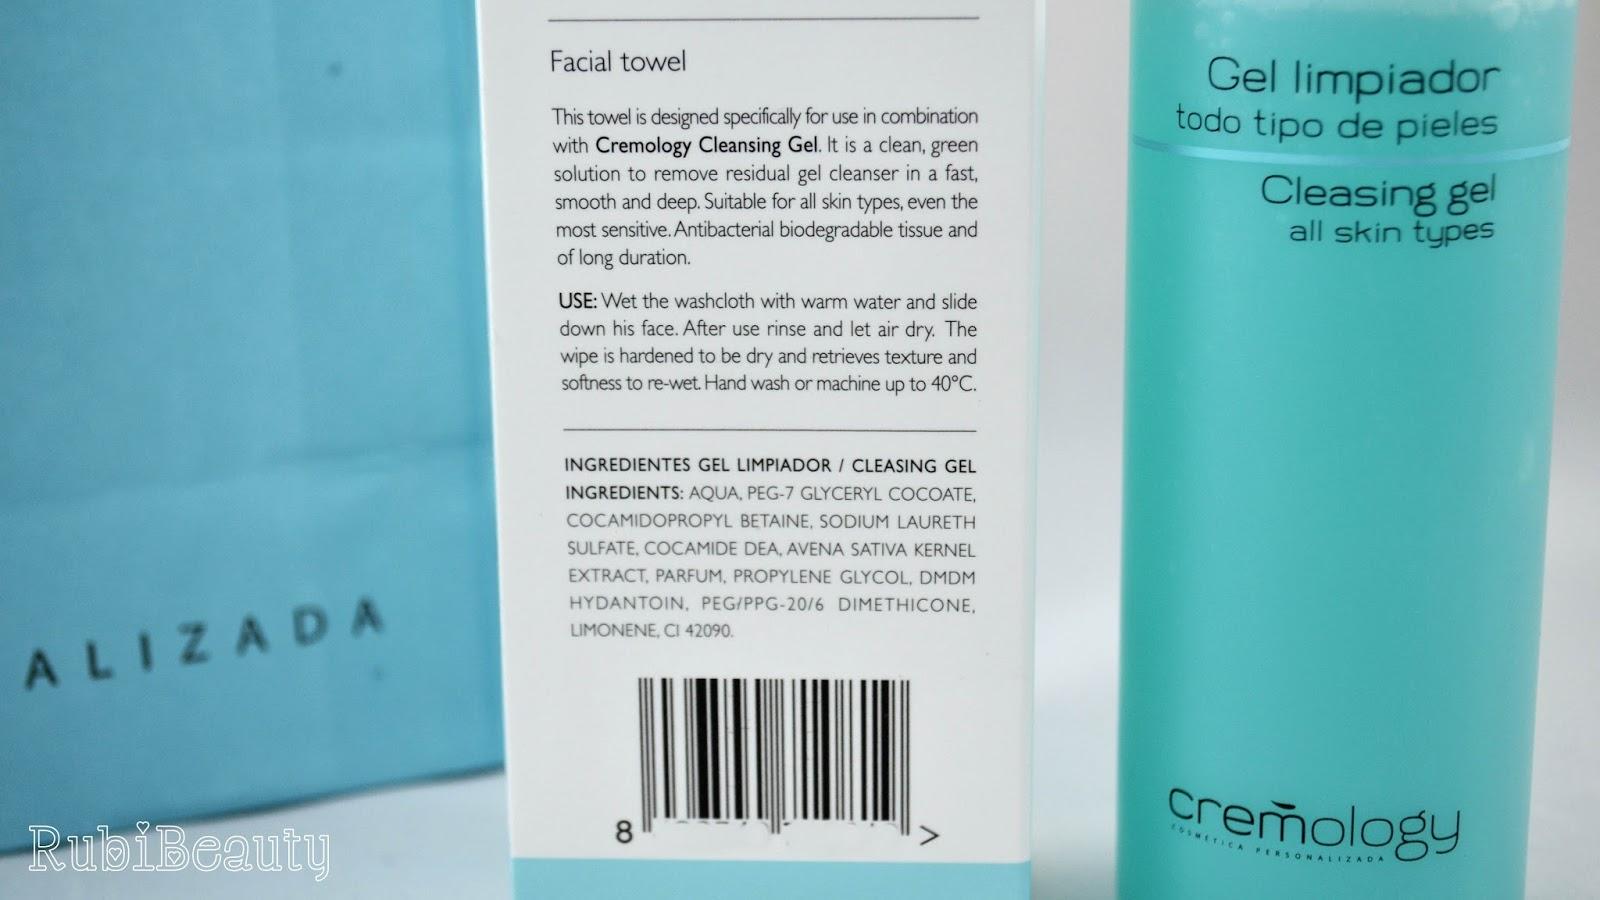 rubibeauty review opinion cremology gel limpiador rutina facial personalizada ingredientes